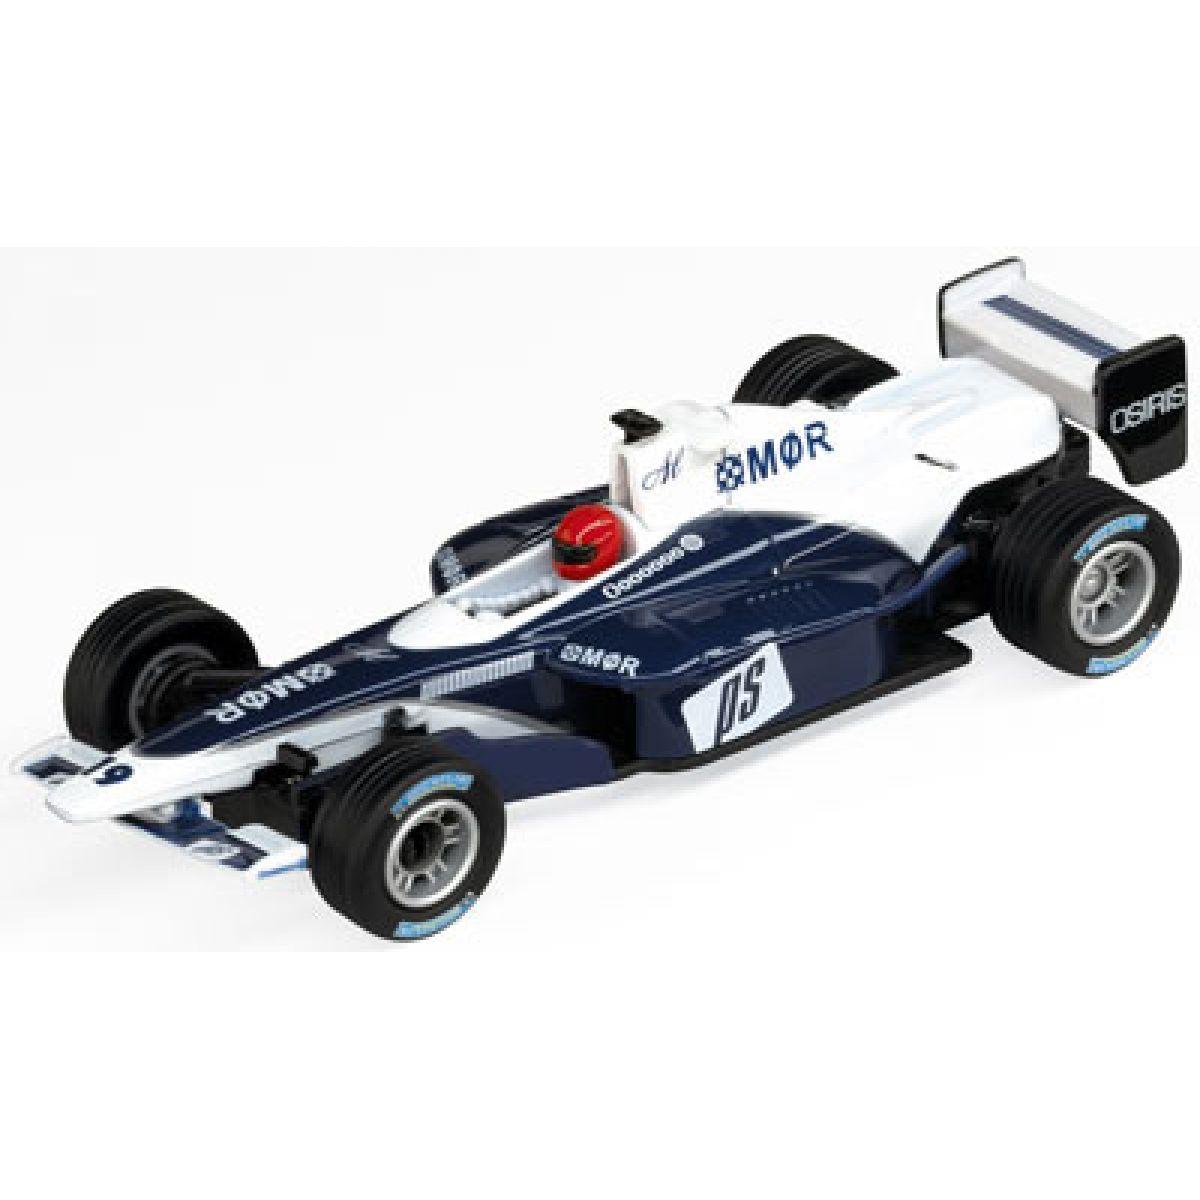 Carrera Formula 1 - type W